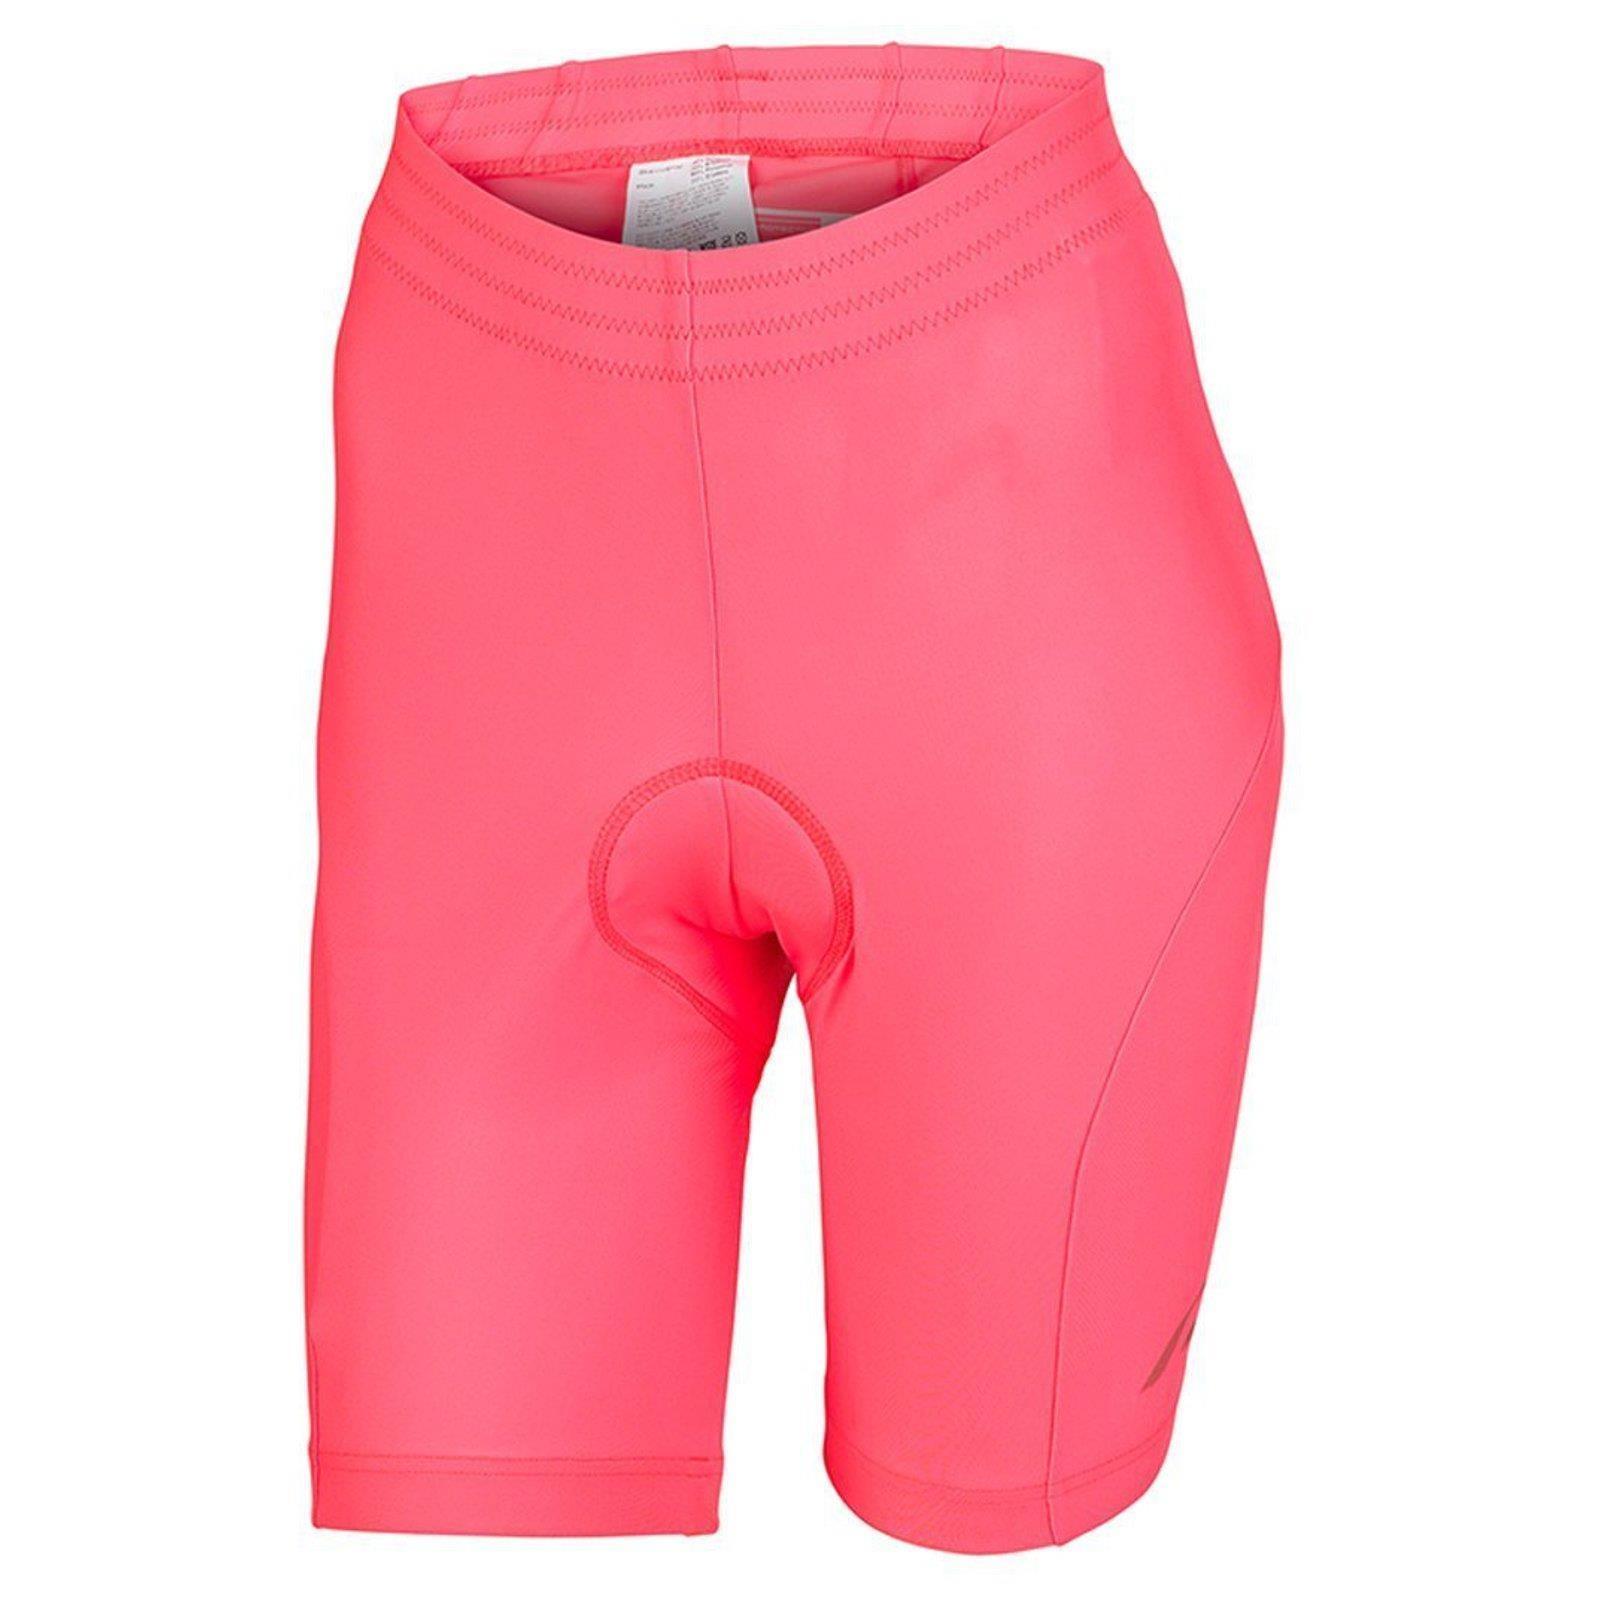 protective damen bund hose catania coral pink fahrrad kurz. Black Bedroom Furniture Sets. Home Design Ideas